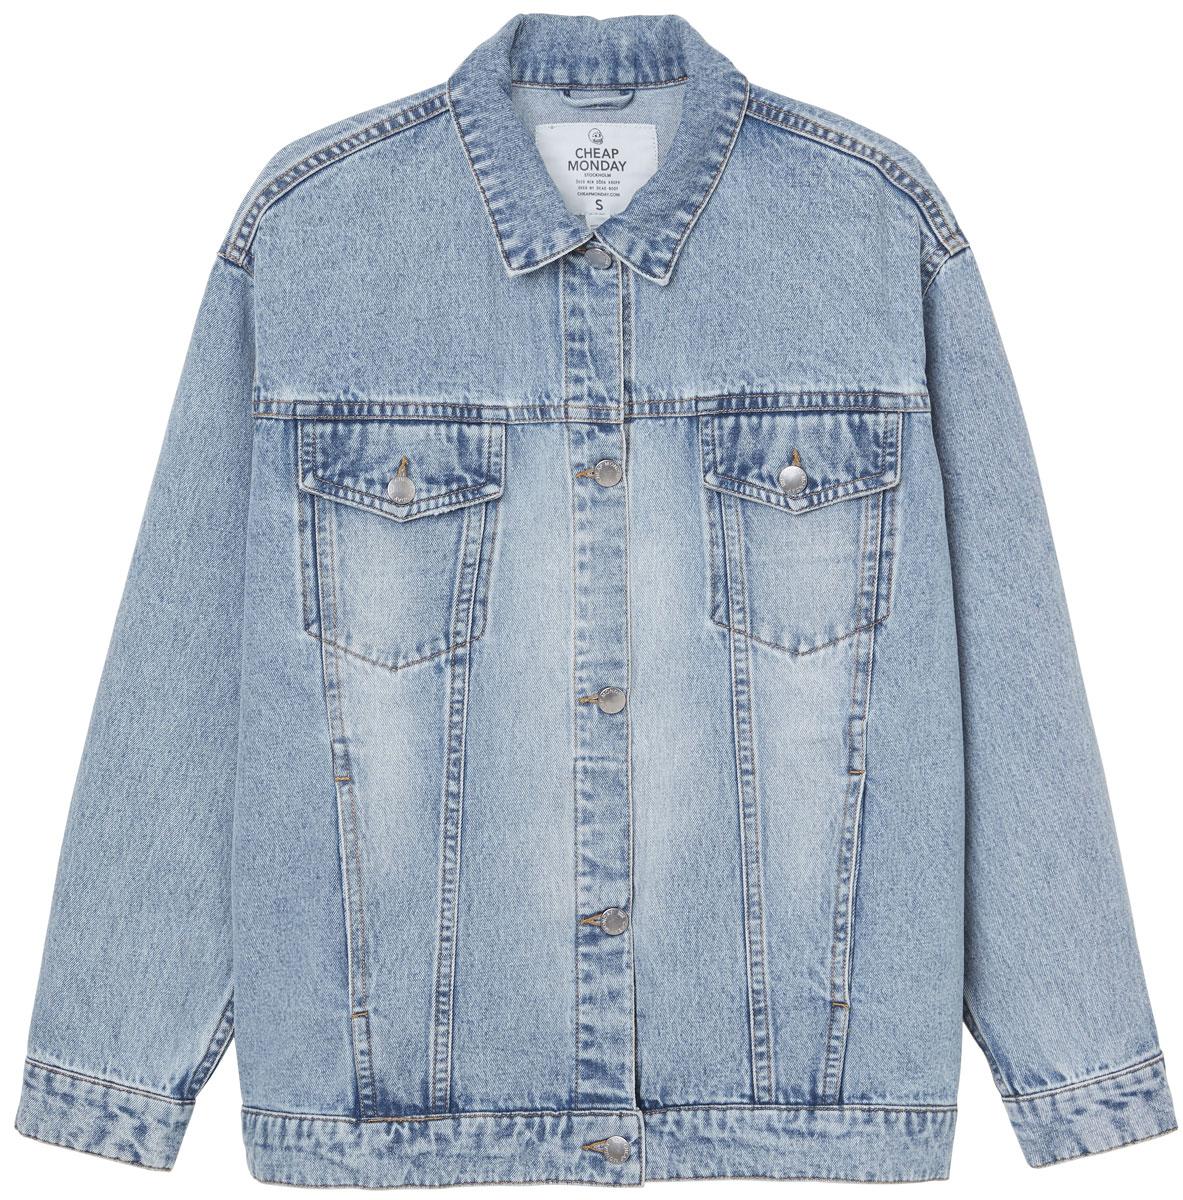 Куртка женская Cheap Monday, цвет: голубой. 0504721. Размер M (44) свитшот женский cheap monday цвет оливковый 0556772 размер m 44